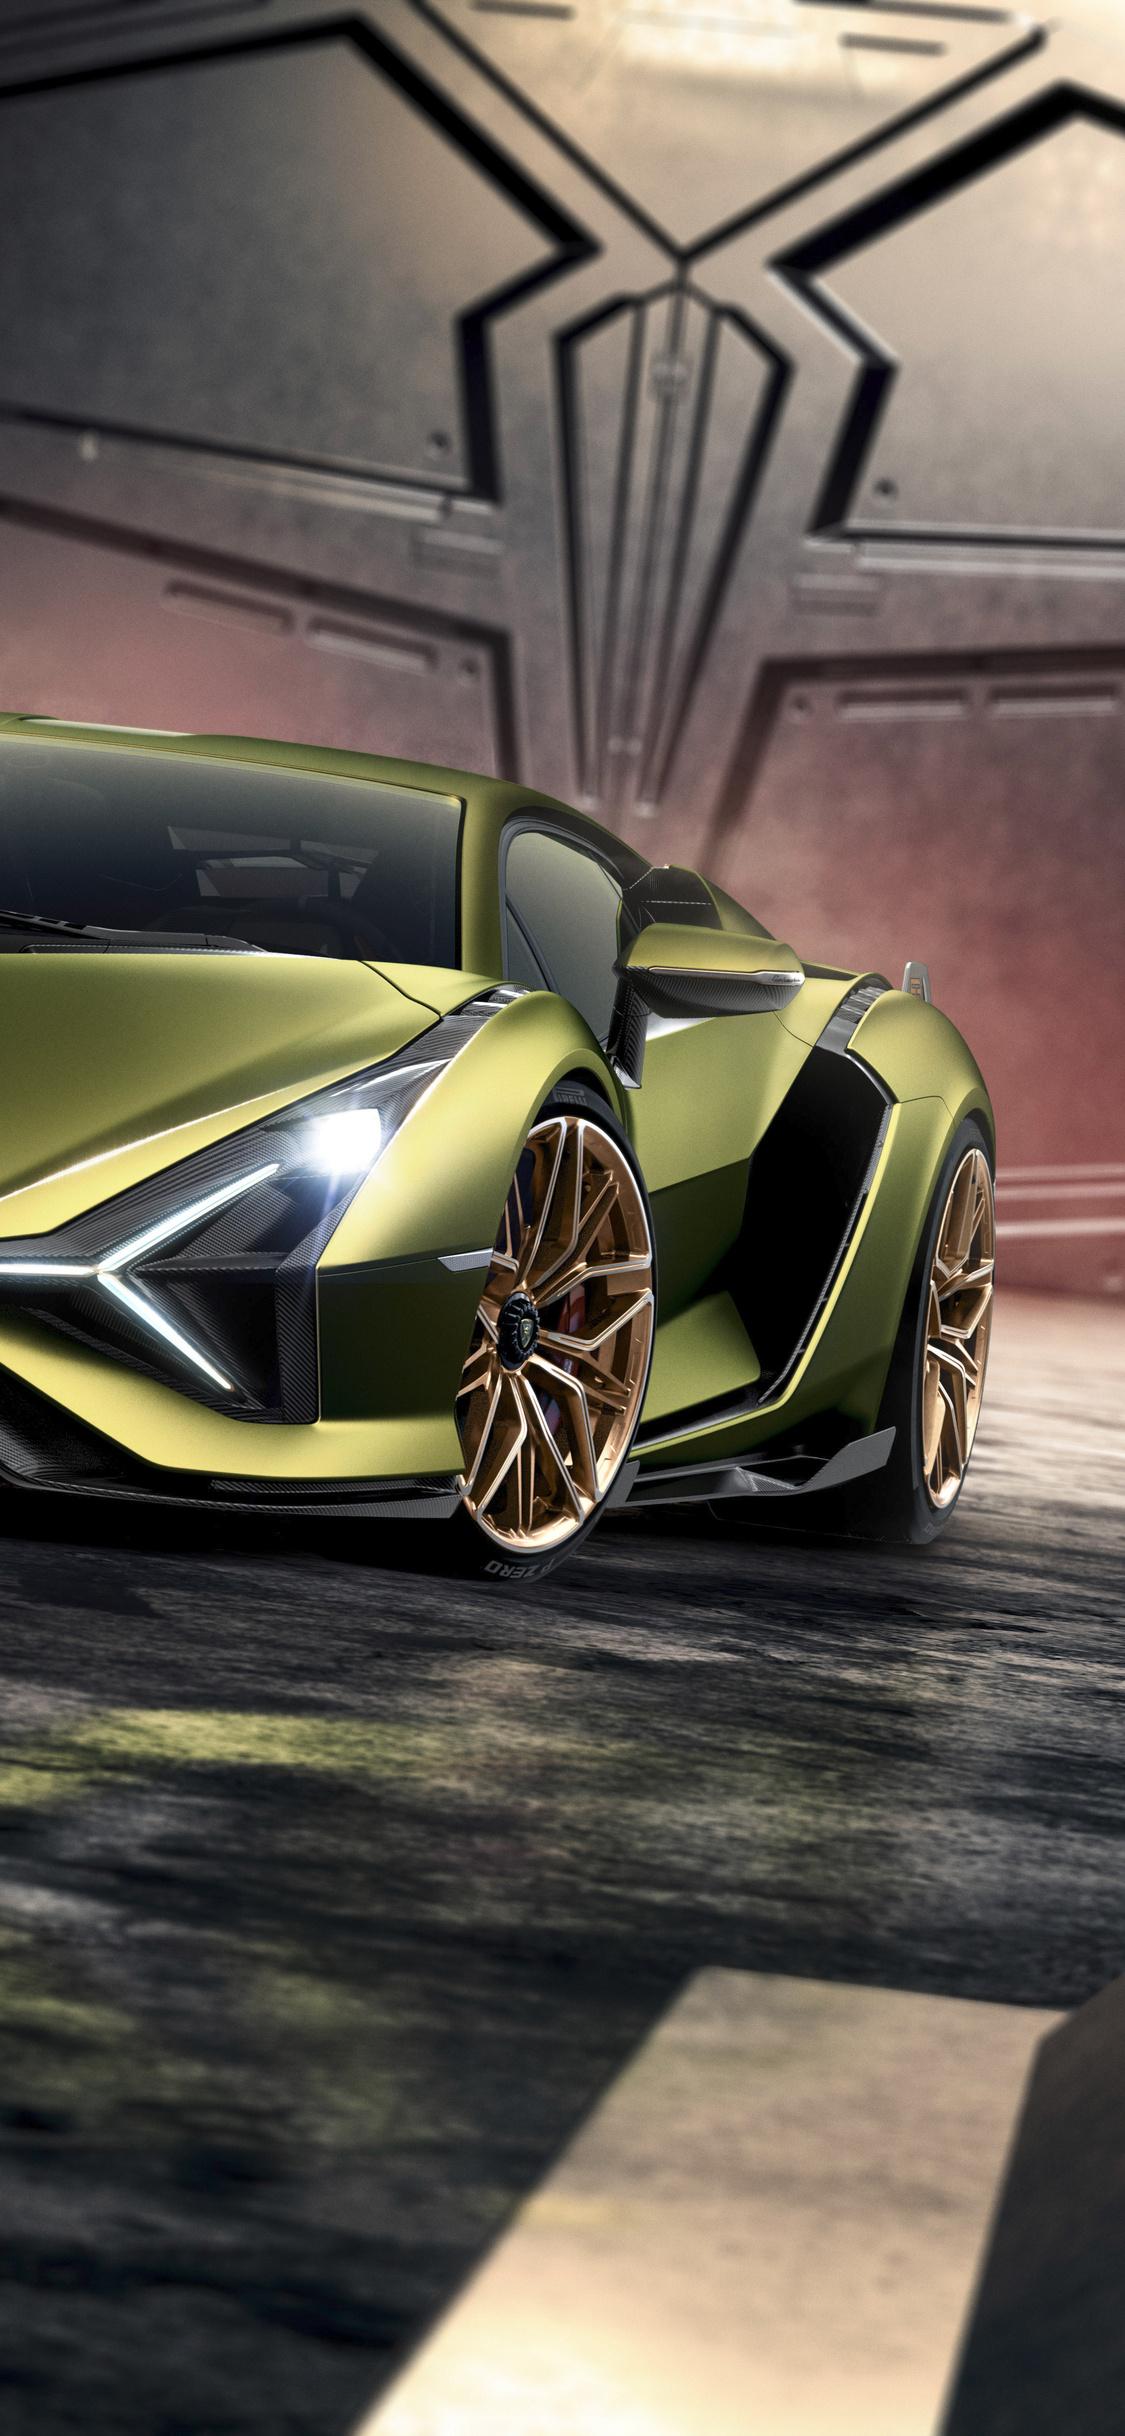 1125x2436 Lamborghini Sian 2019 Iphone XS,Iphone 10,Iphone X